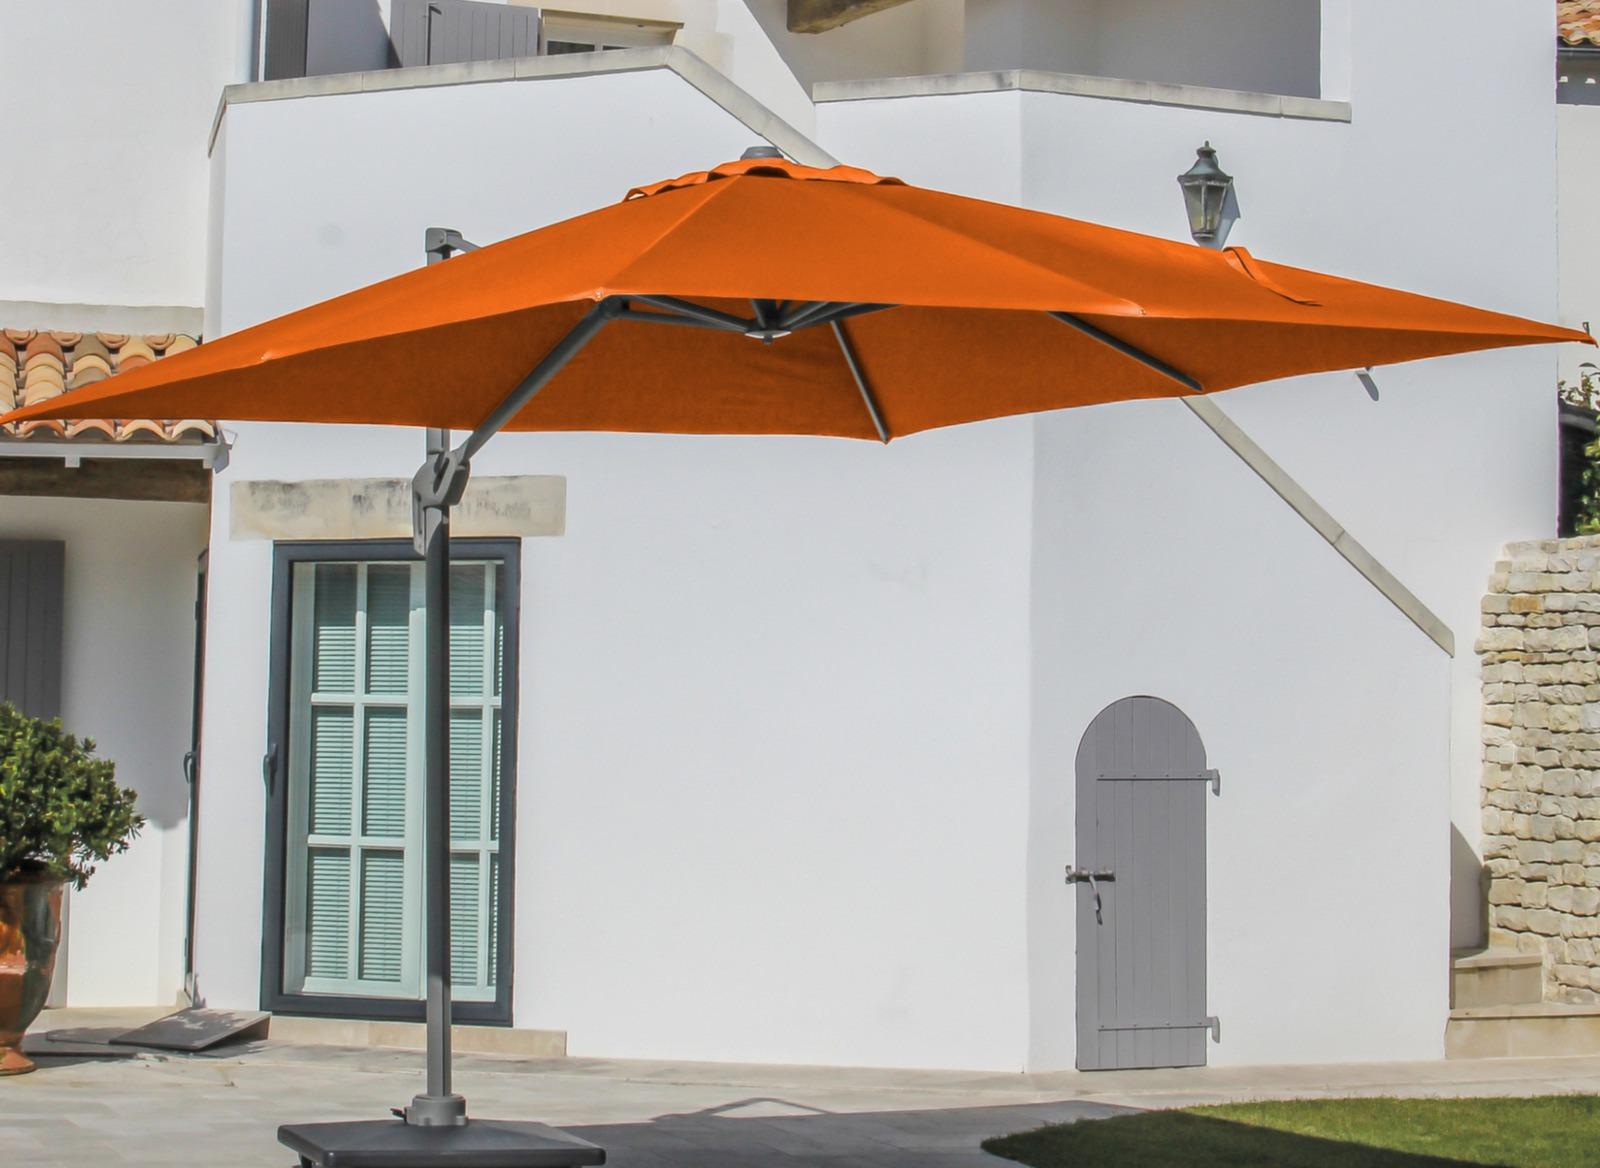 parasol d port carr orange 3x3m avec m t taupe oc o. Black Bedroom Furniture Sets. Home Design Ideas